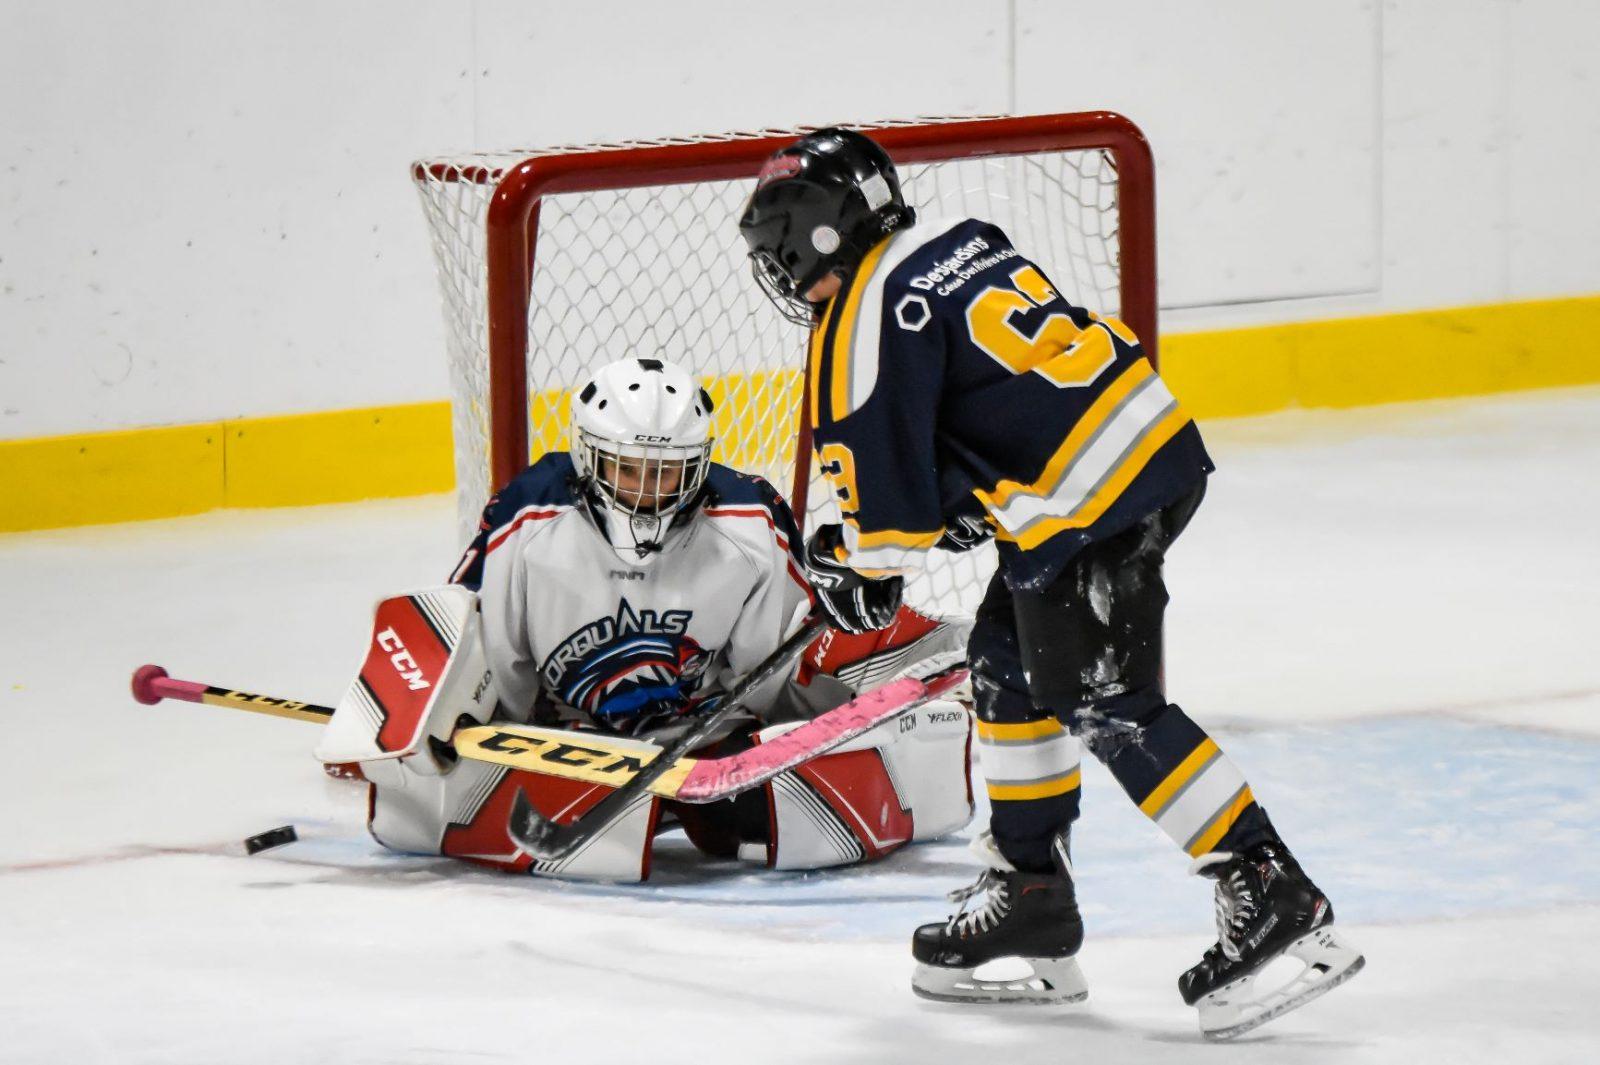 Baie-Saint-Paul annule deux tournois de hockey